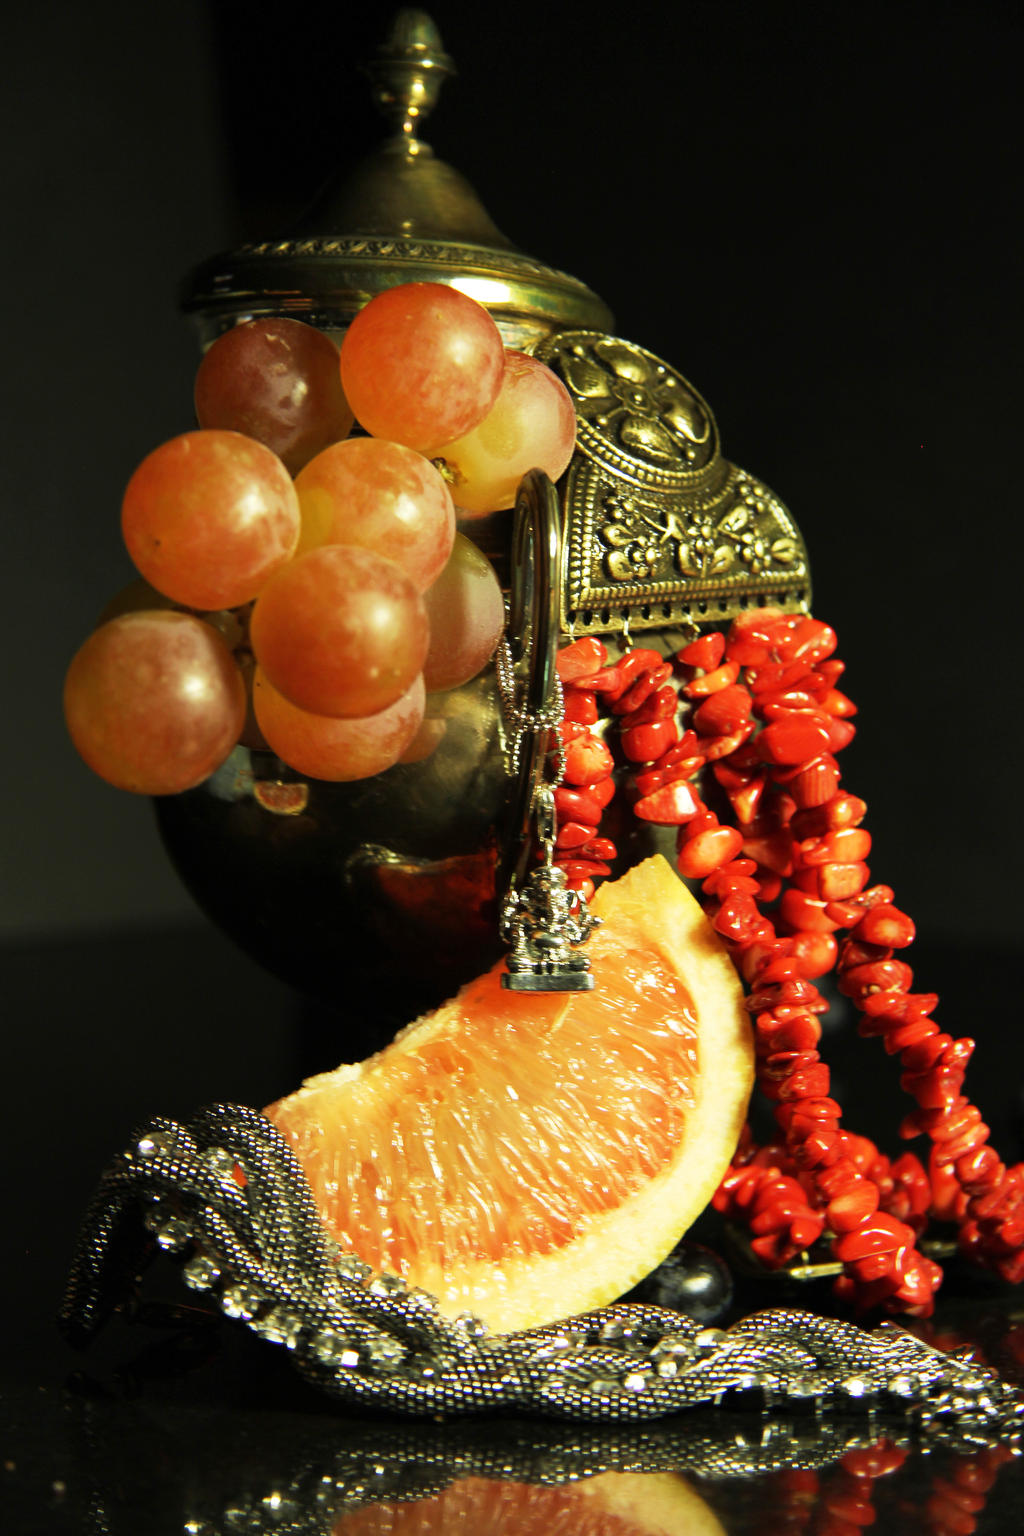 Still life with fruit and a charm by M-a-s-h-a